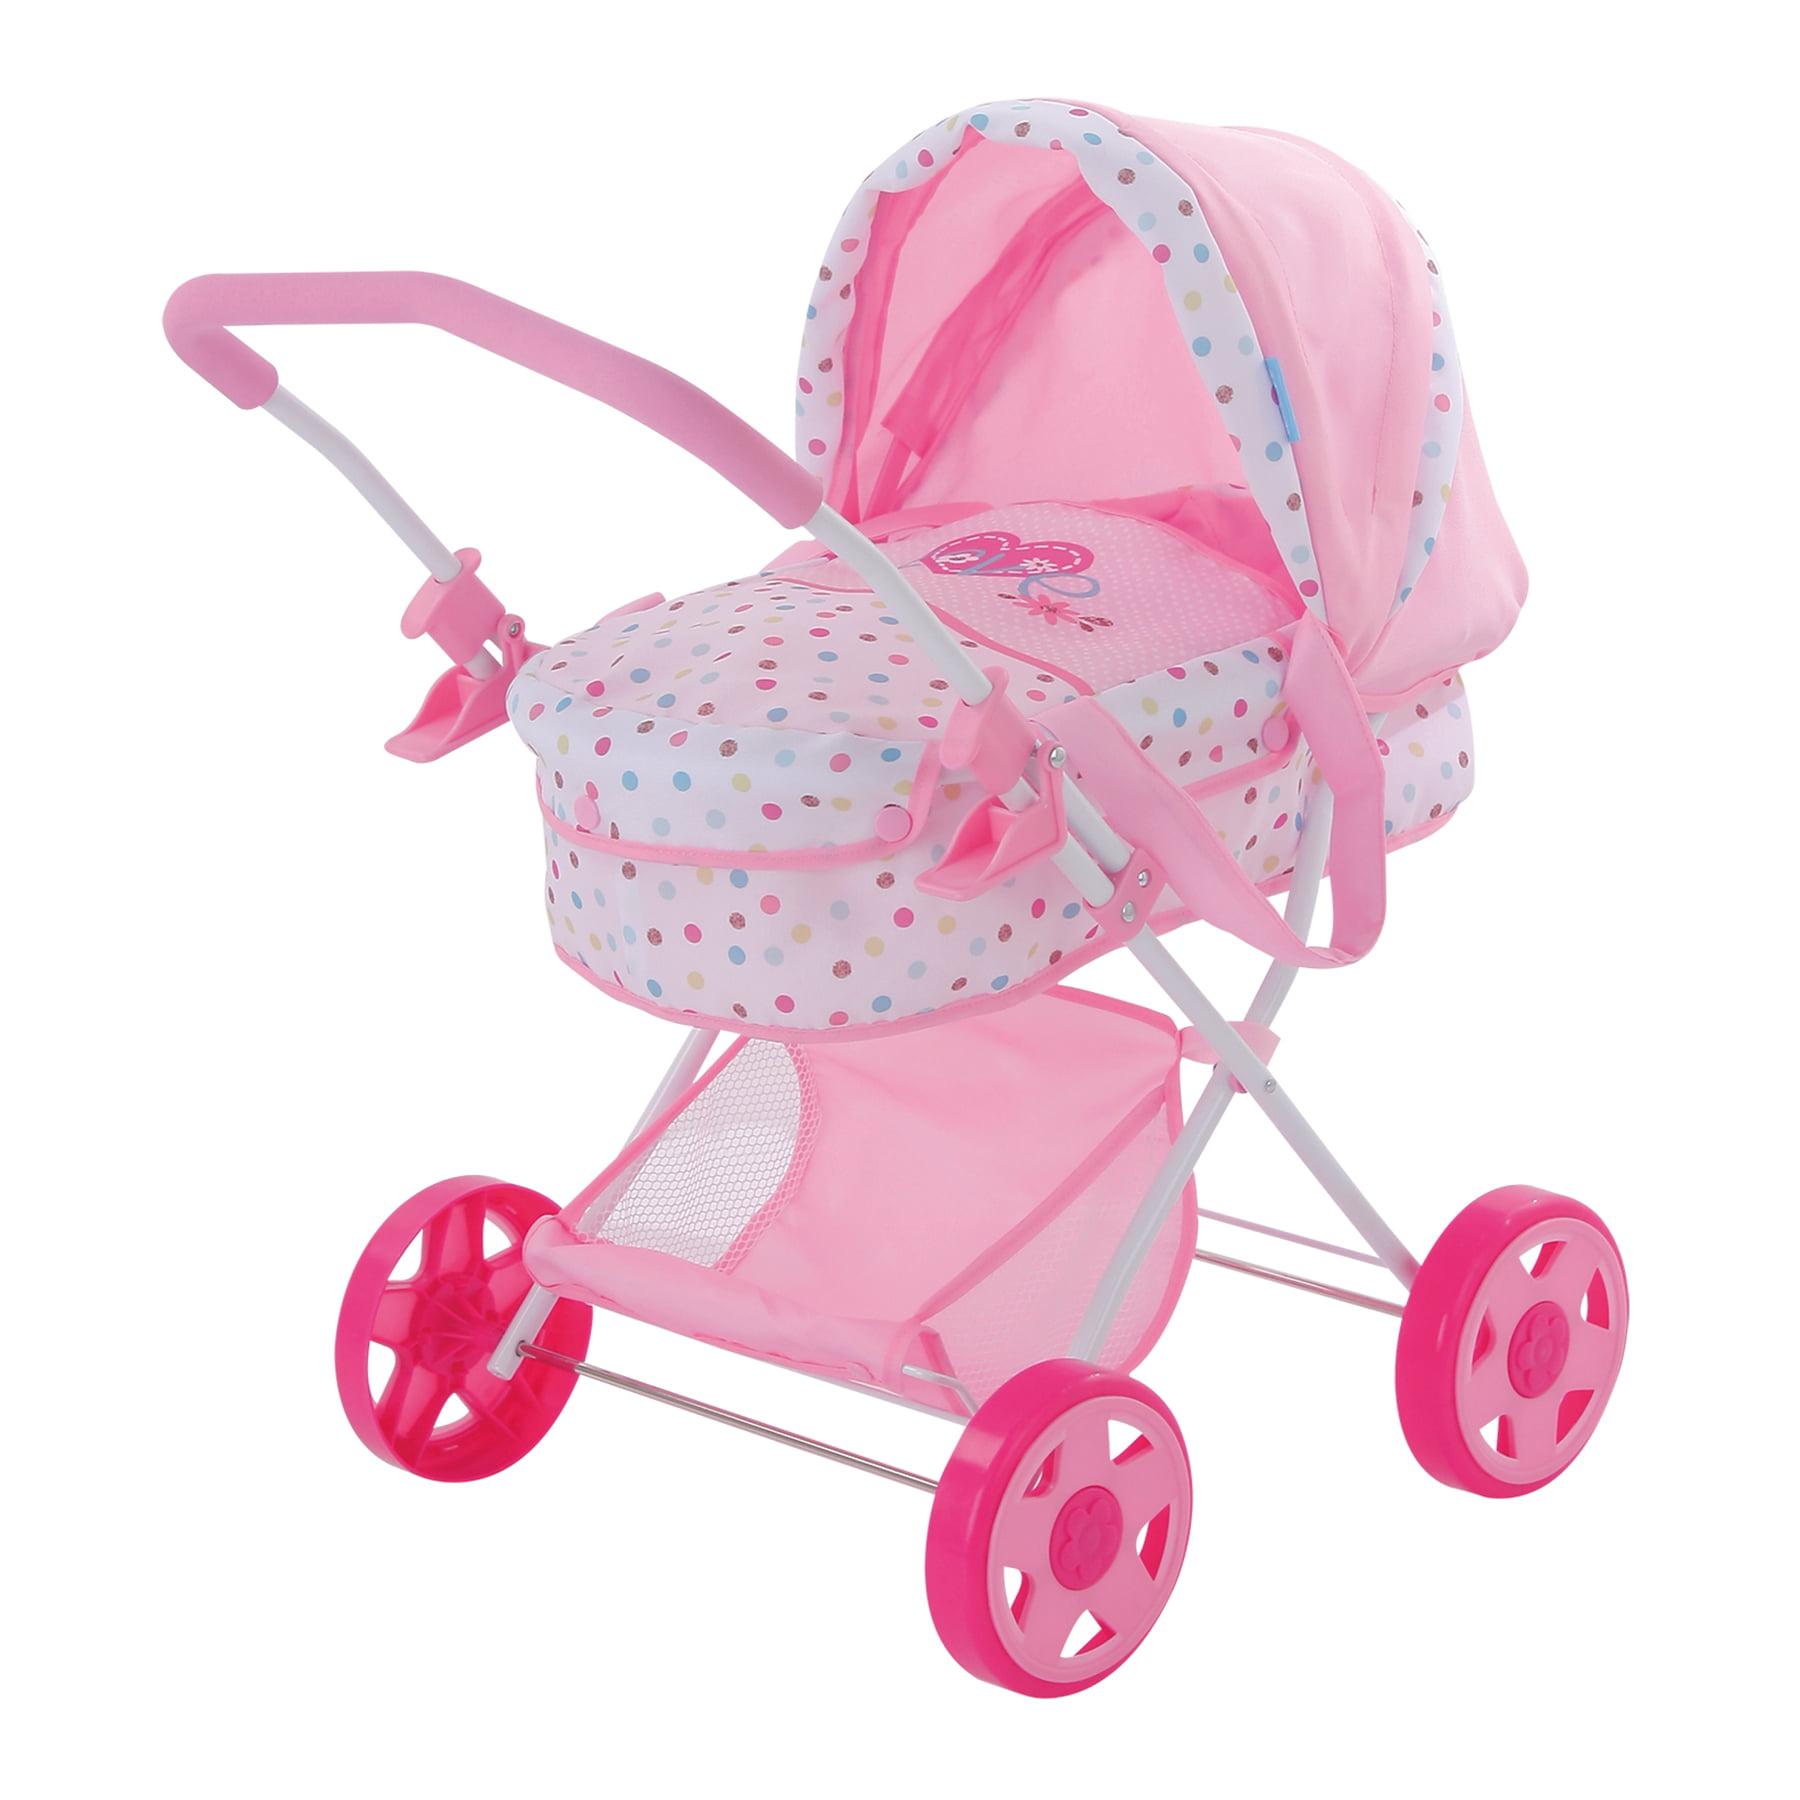 Hauck Love Heart Pretend Play Baby Doll Pram Stroller